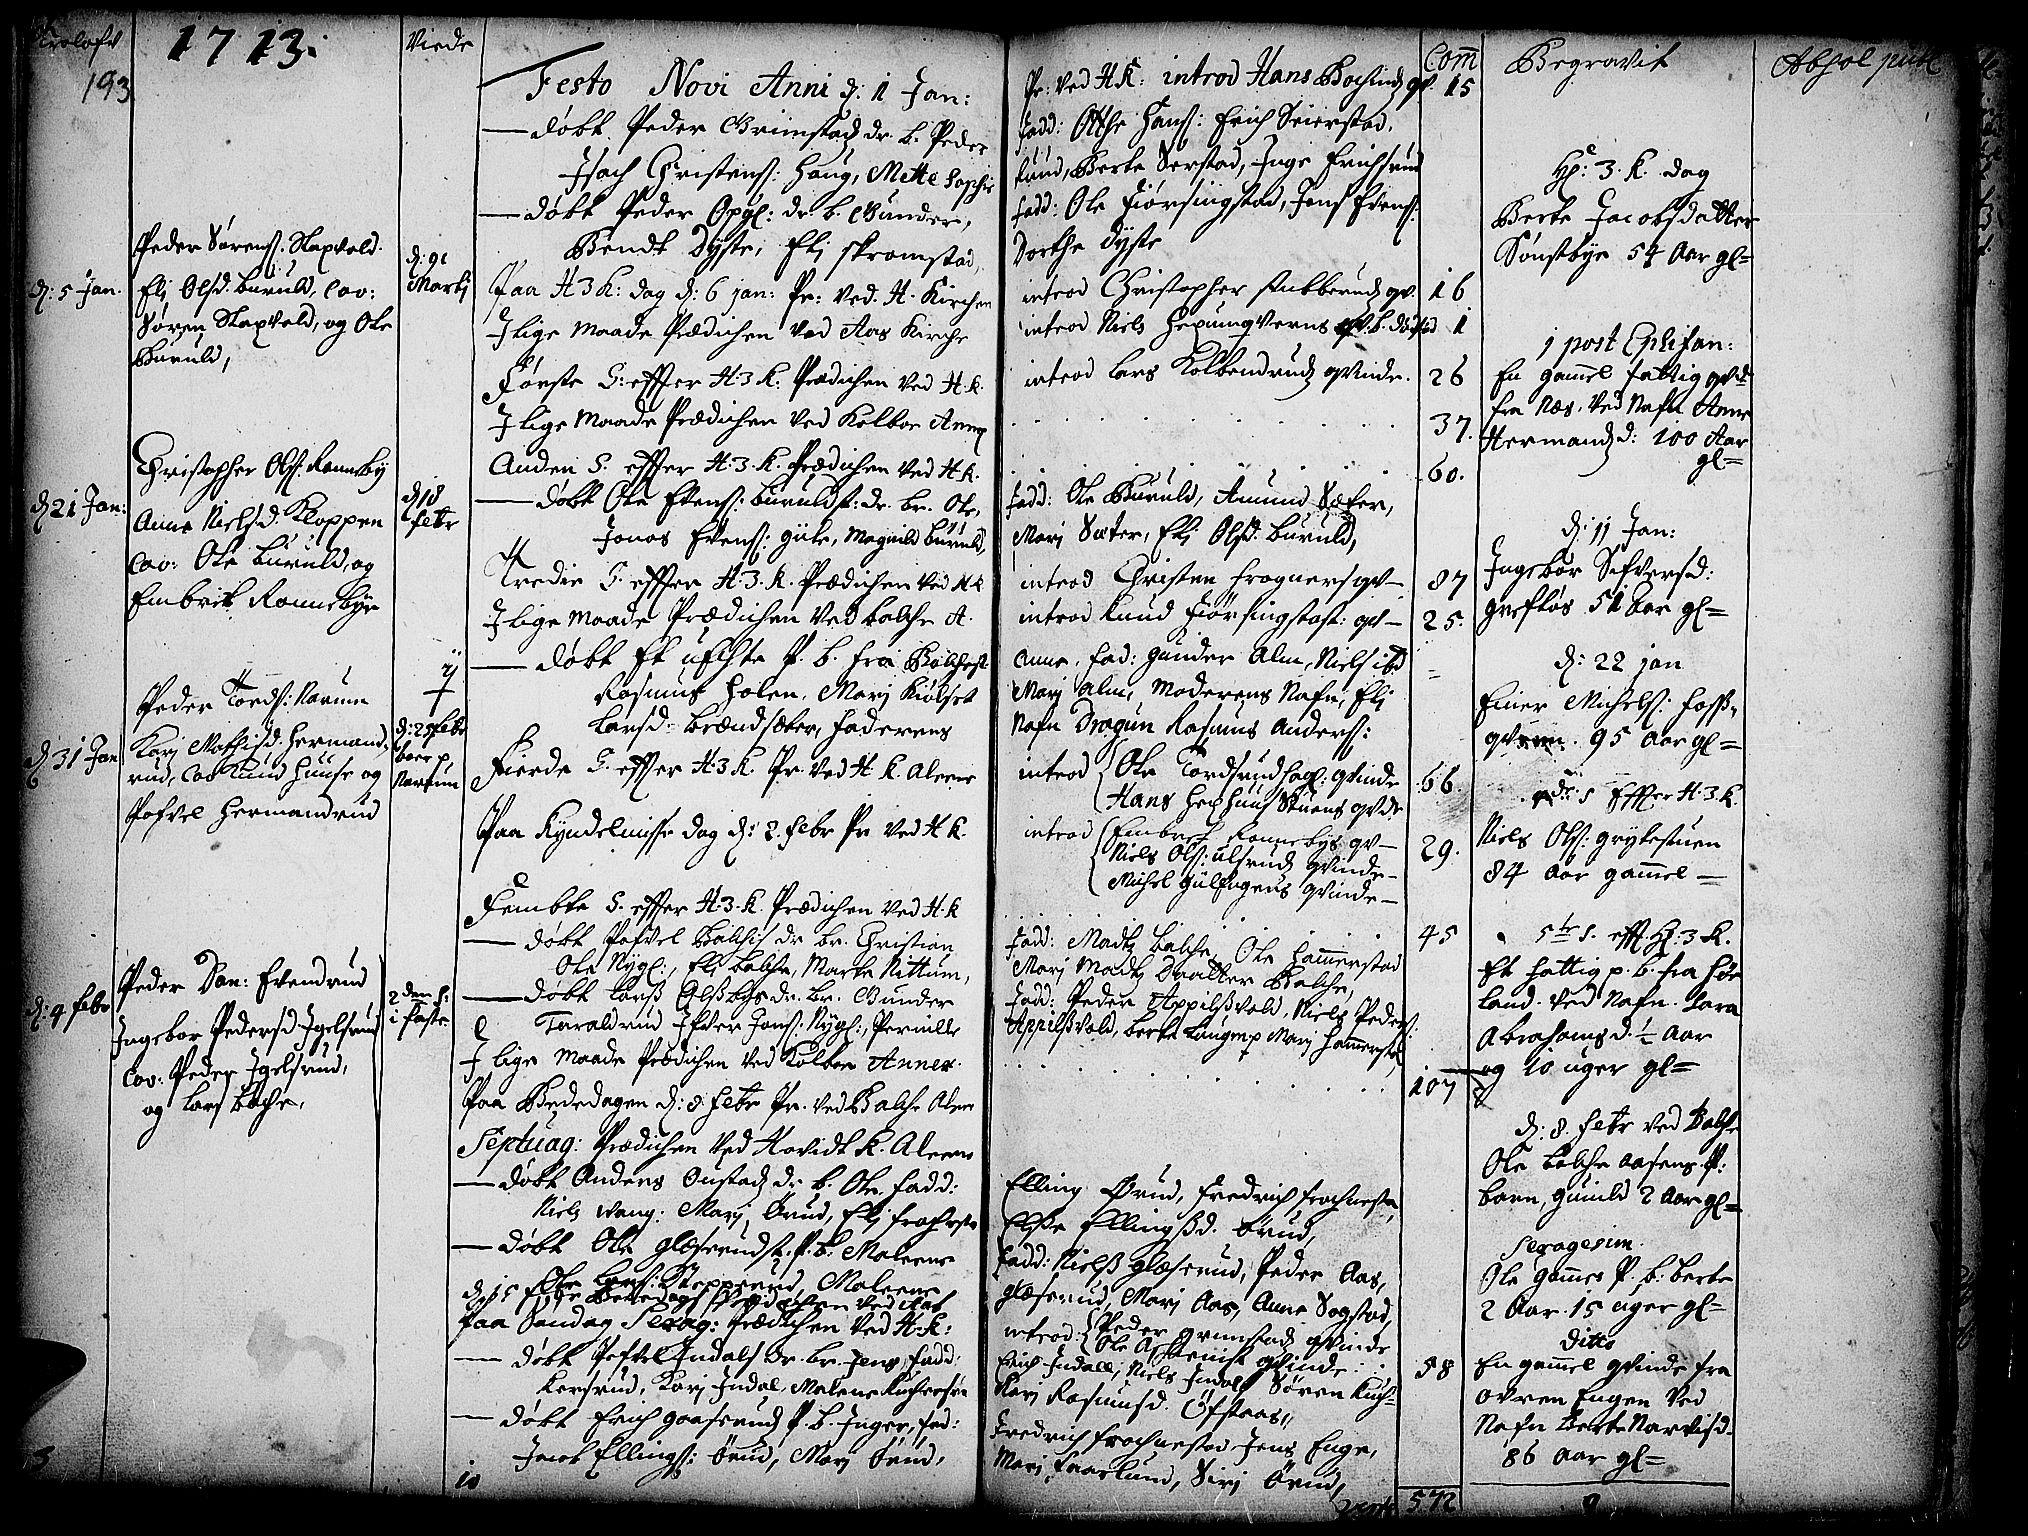 SAH, Toten prestekontor, Ministerialbok nr. 1, 1695-1713, s. 193